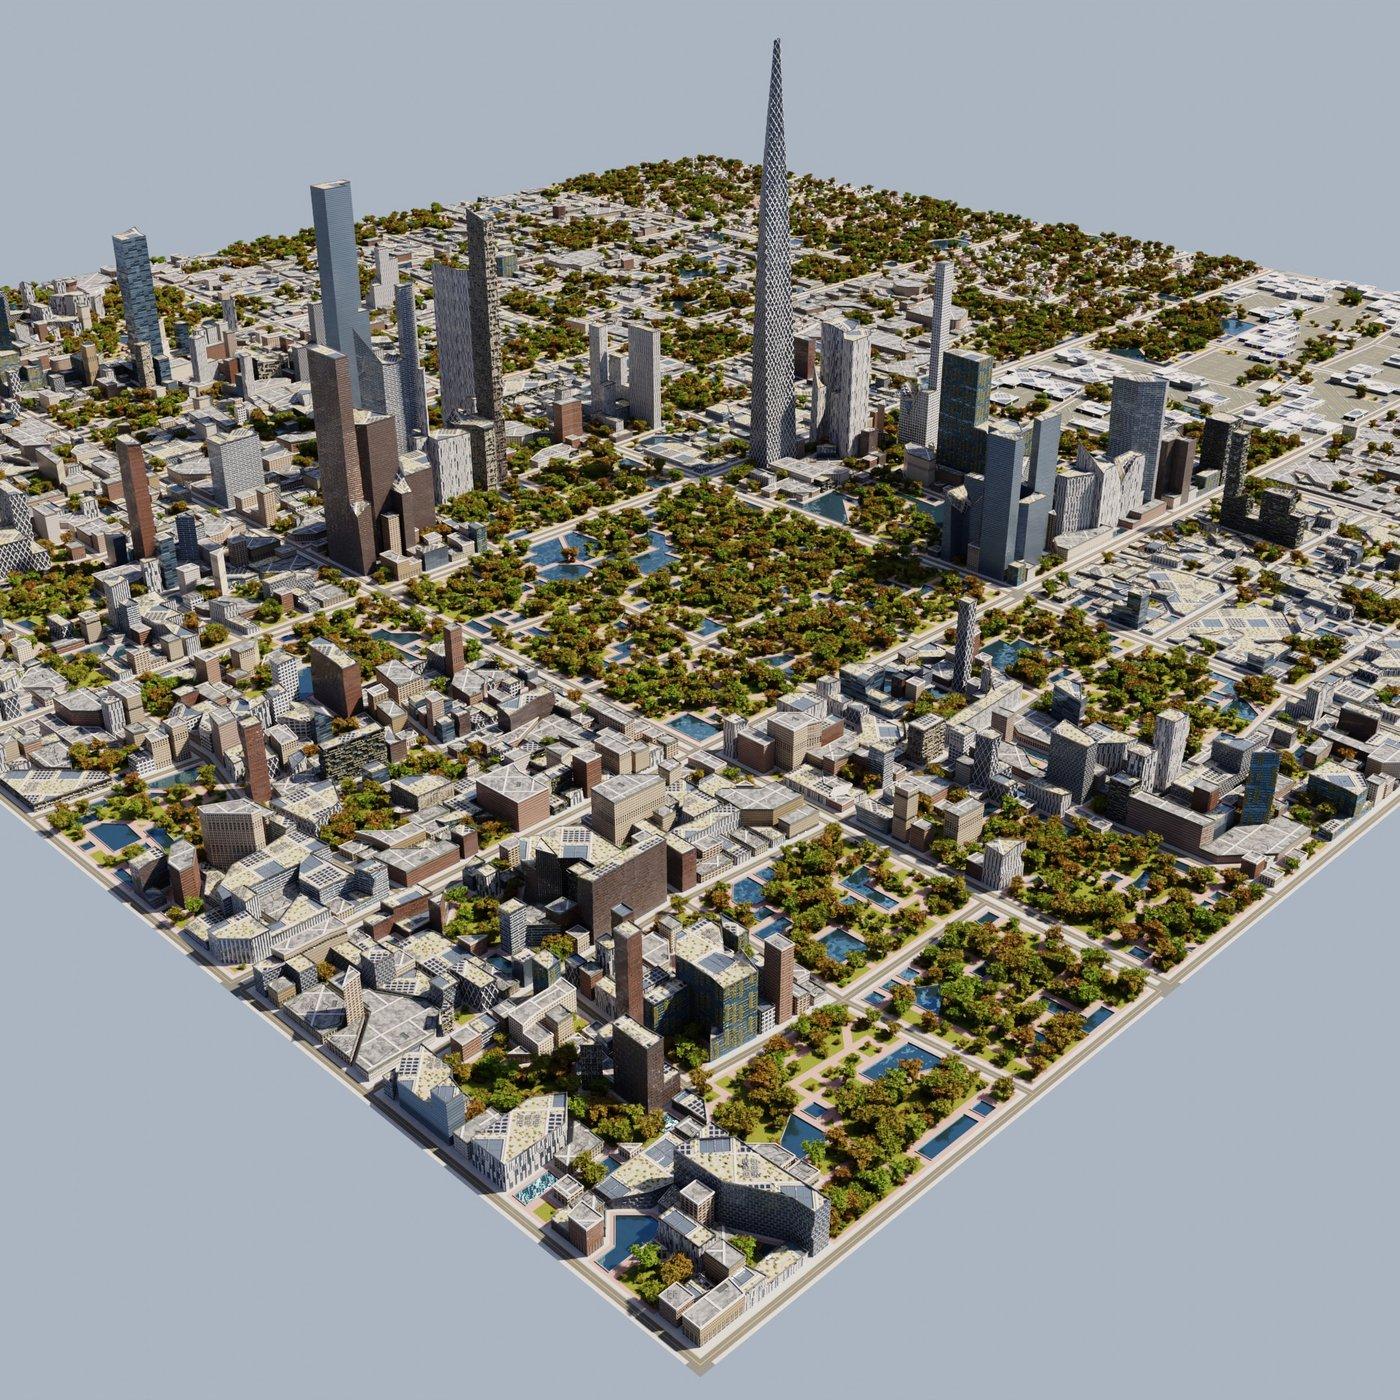 Blender Cycles Modern Modular City